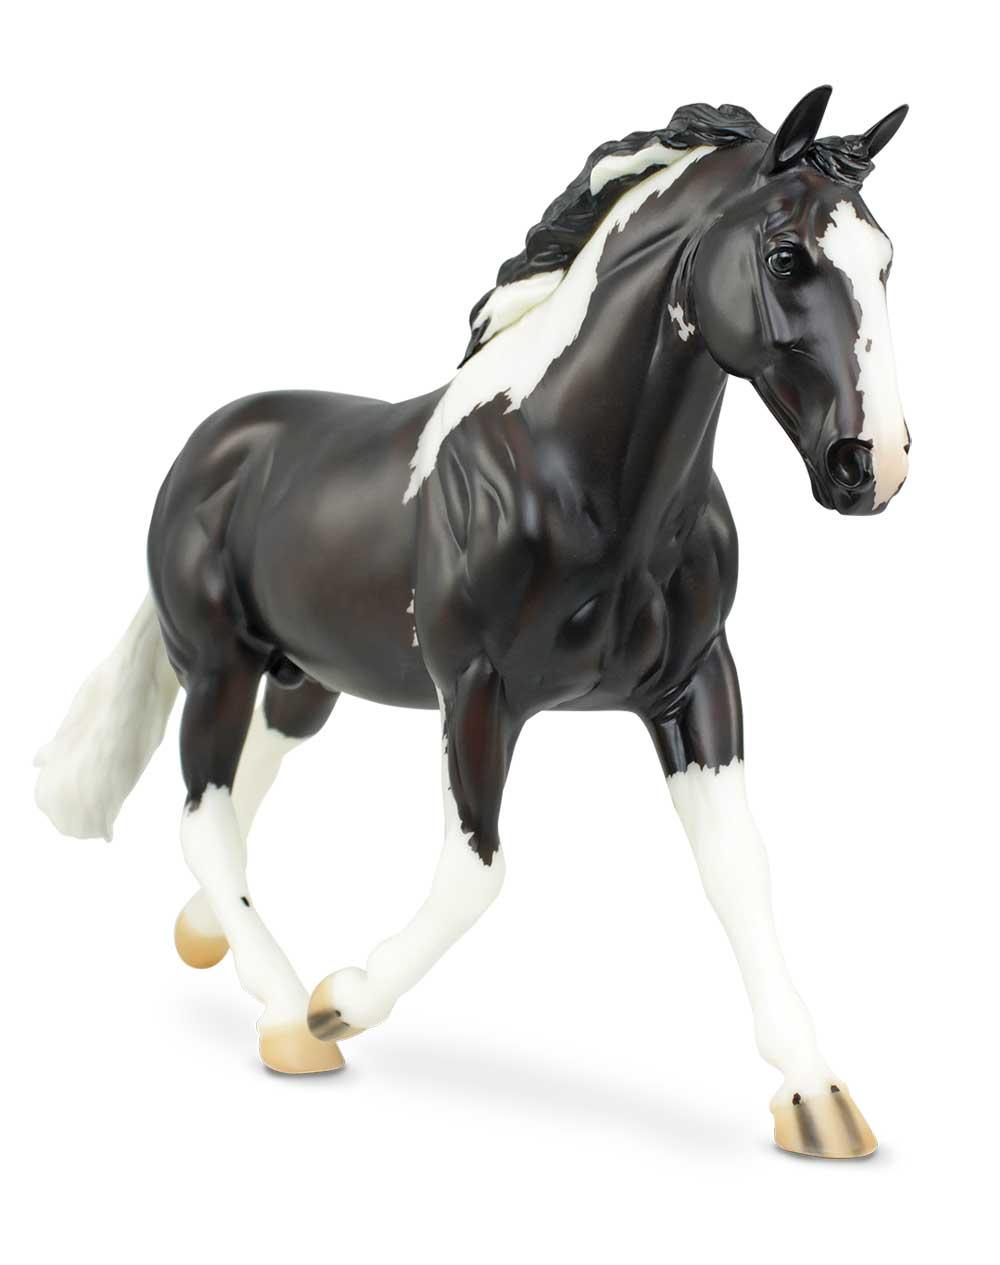 Oliver's official BreyerFest Celebration model horse.